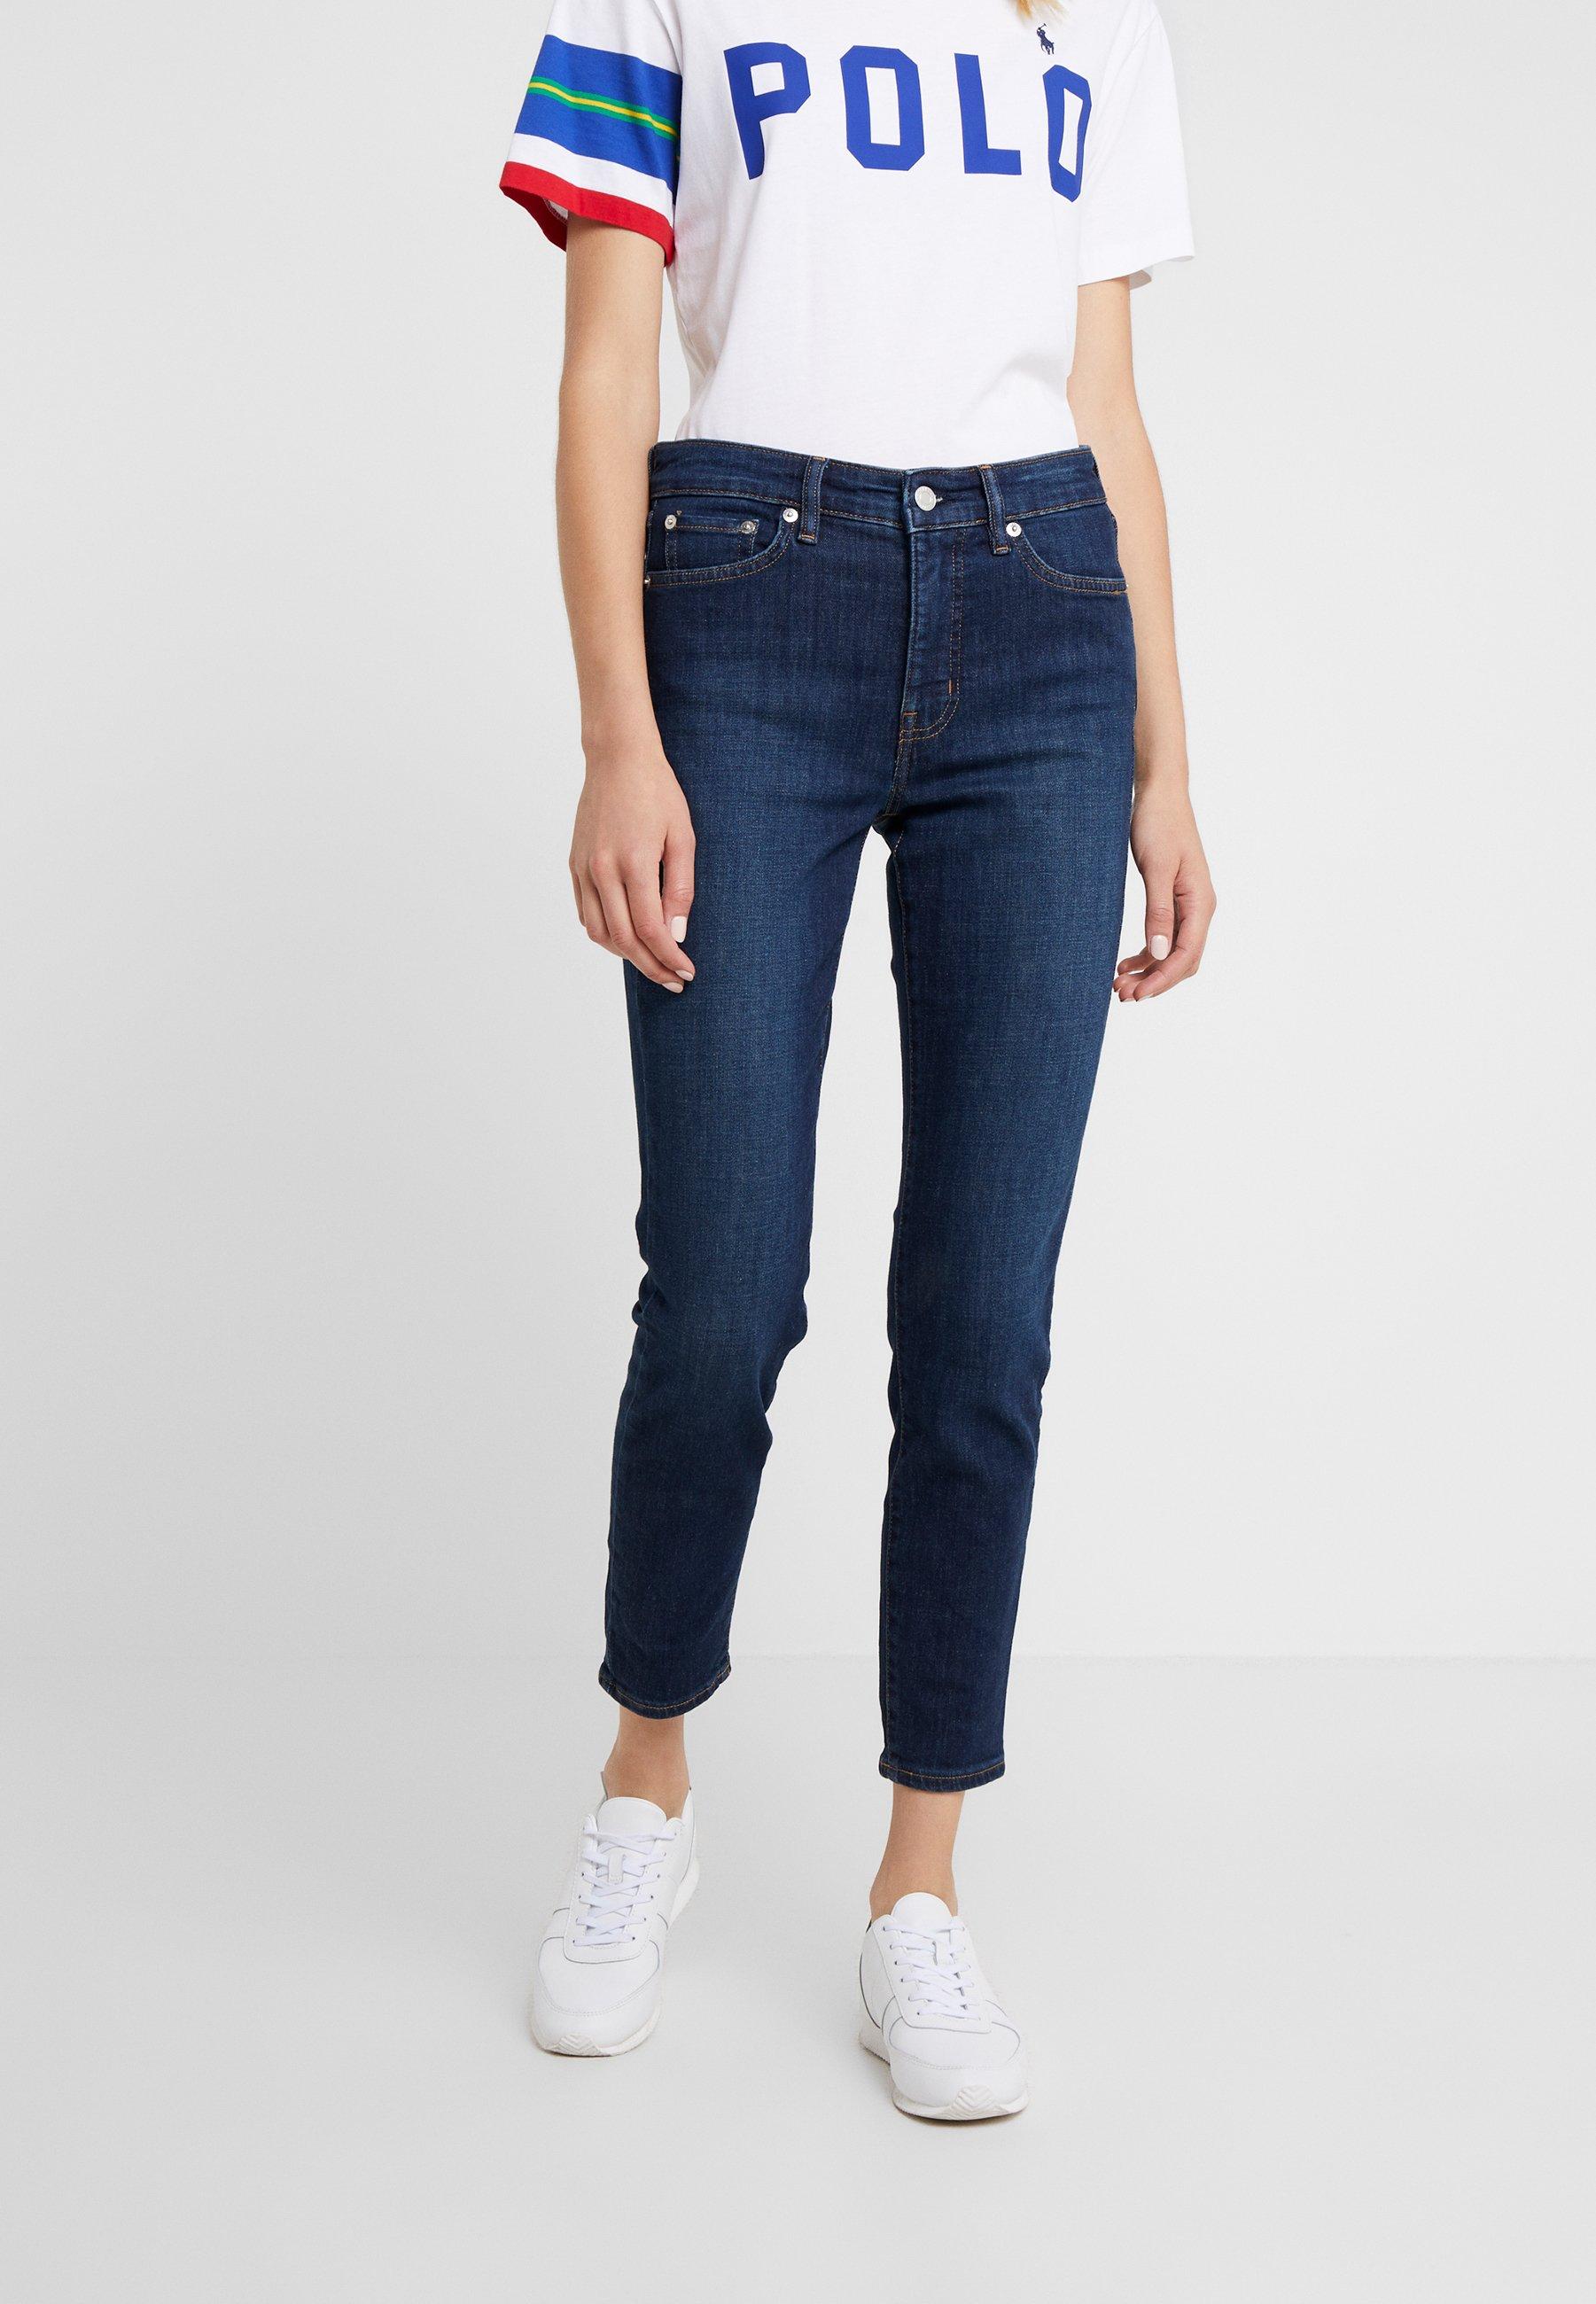 Bonne vente Meilleurs prix Lauren Ralph Lauren Jeans Skinny - dark worn wash - ZALANDO.FR 7VARy